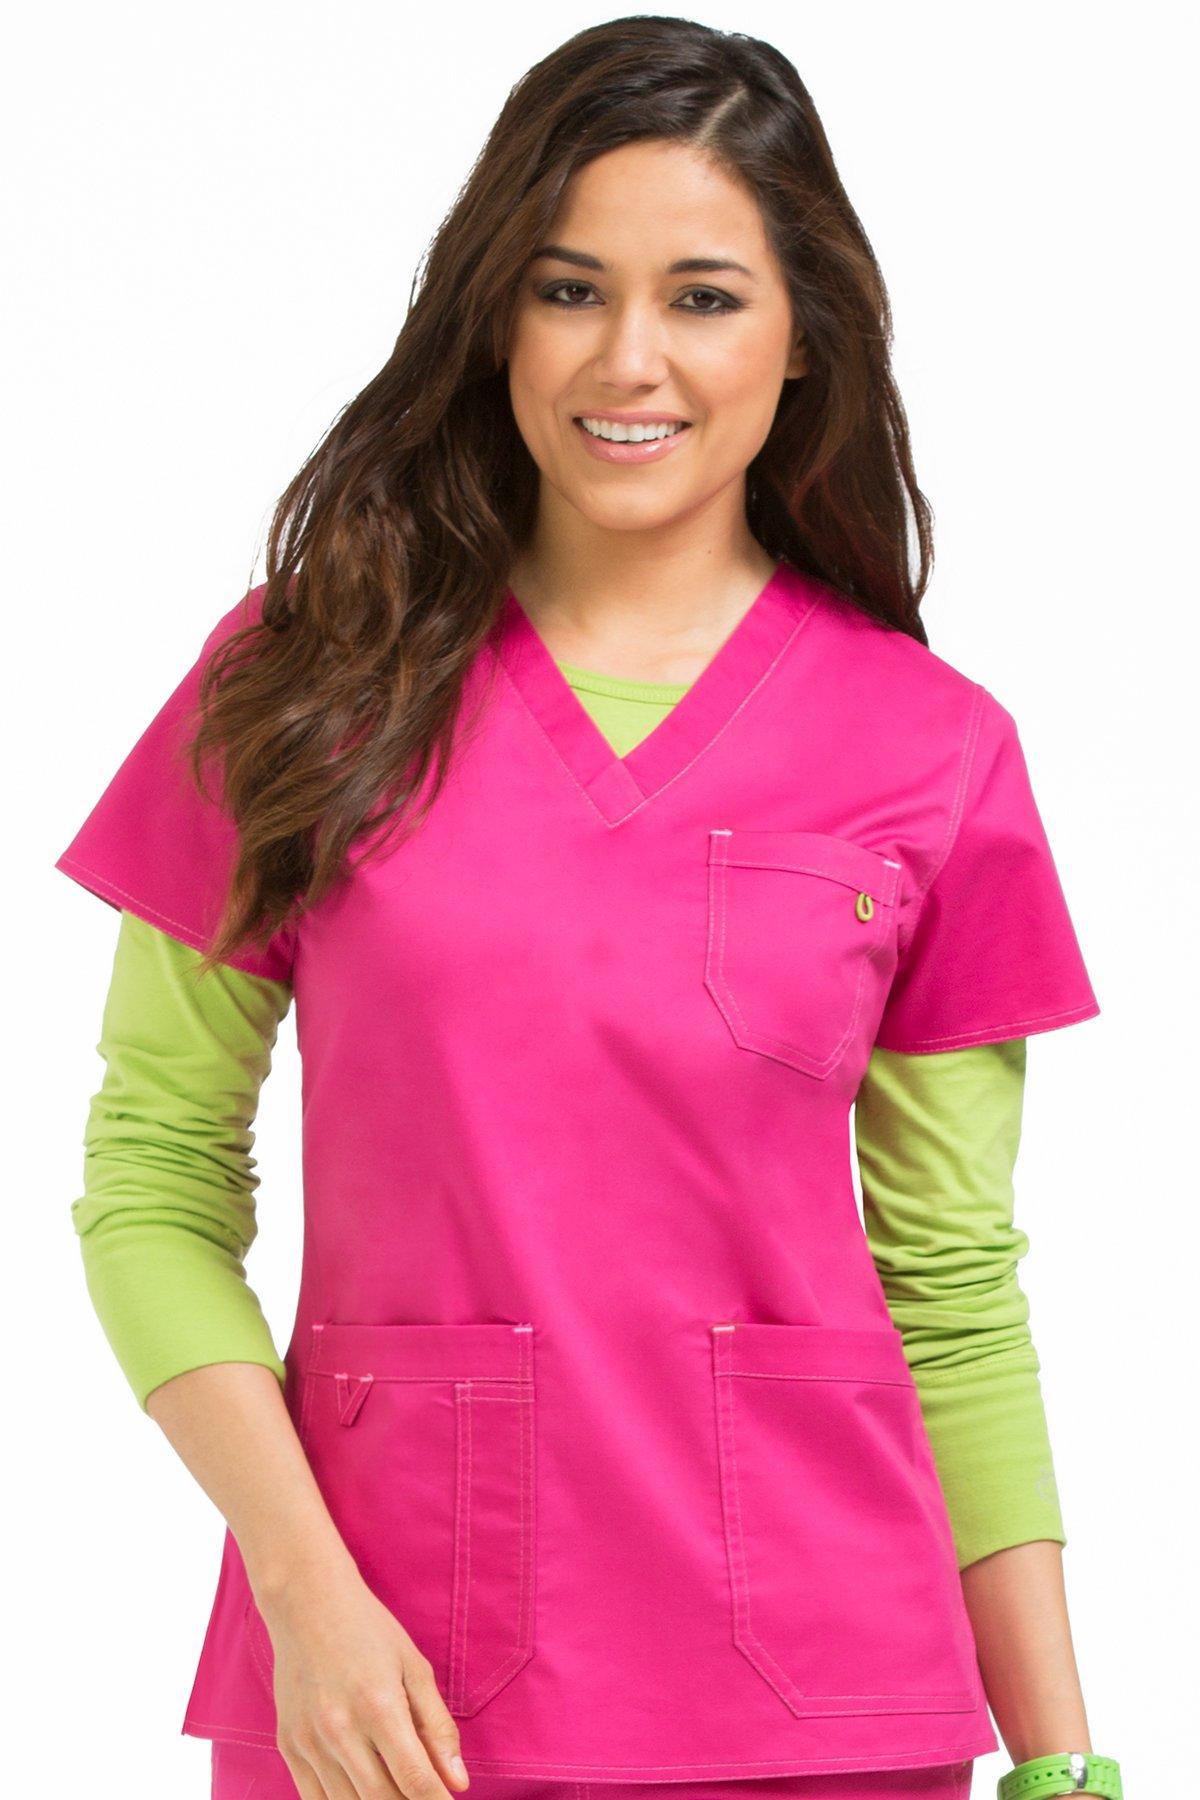 Med Couture Women's 'MC2' V-Neck Multi-Pocket Niki Scrub Top, Pink-A-Licious, Small